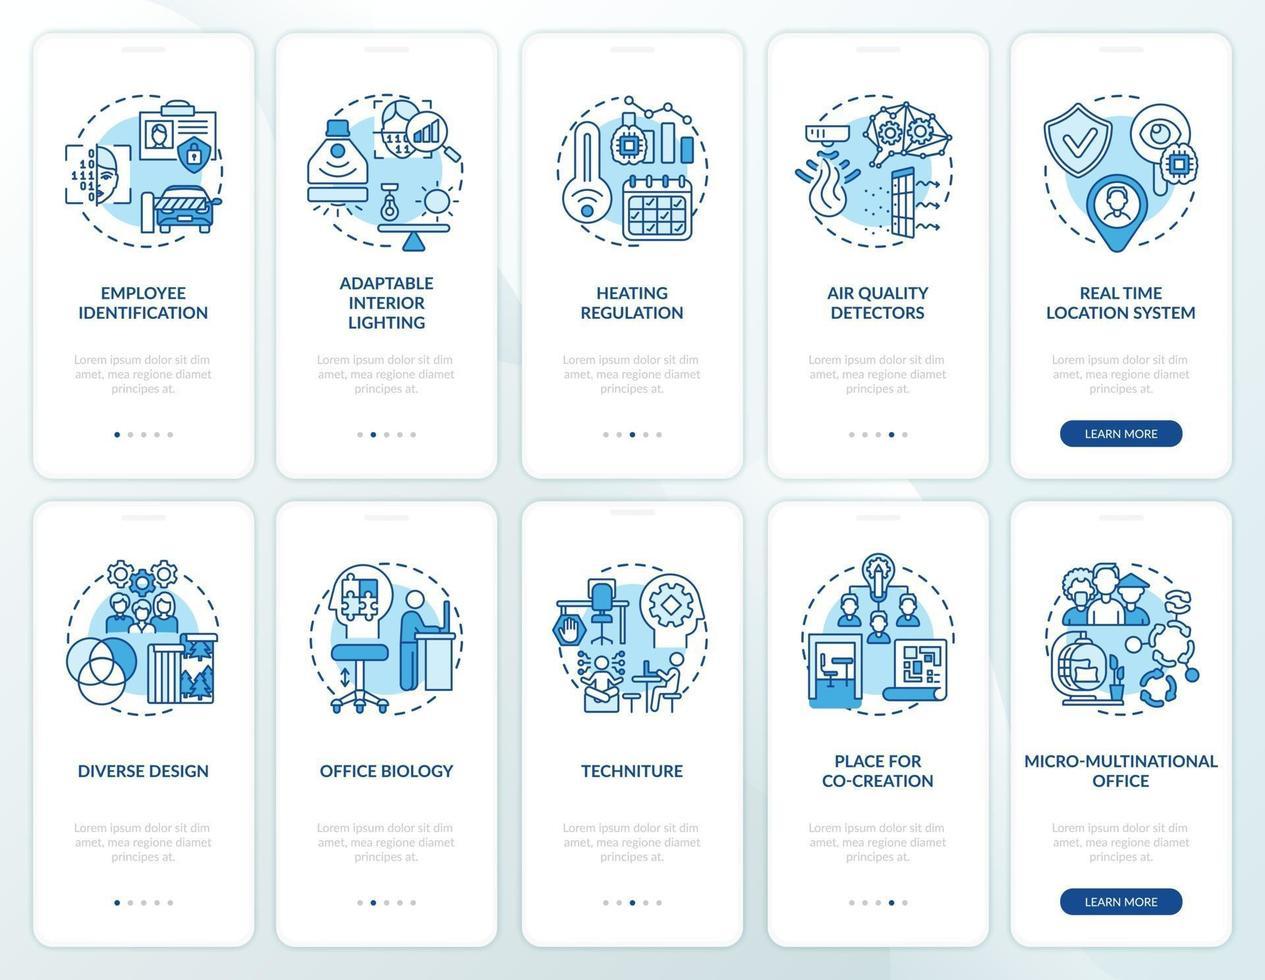 smart kontorsplanering ombord mobilappsskärm med begrepp vektor